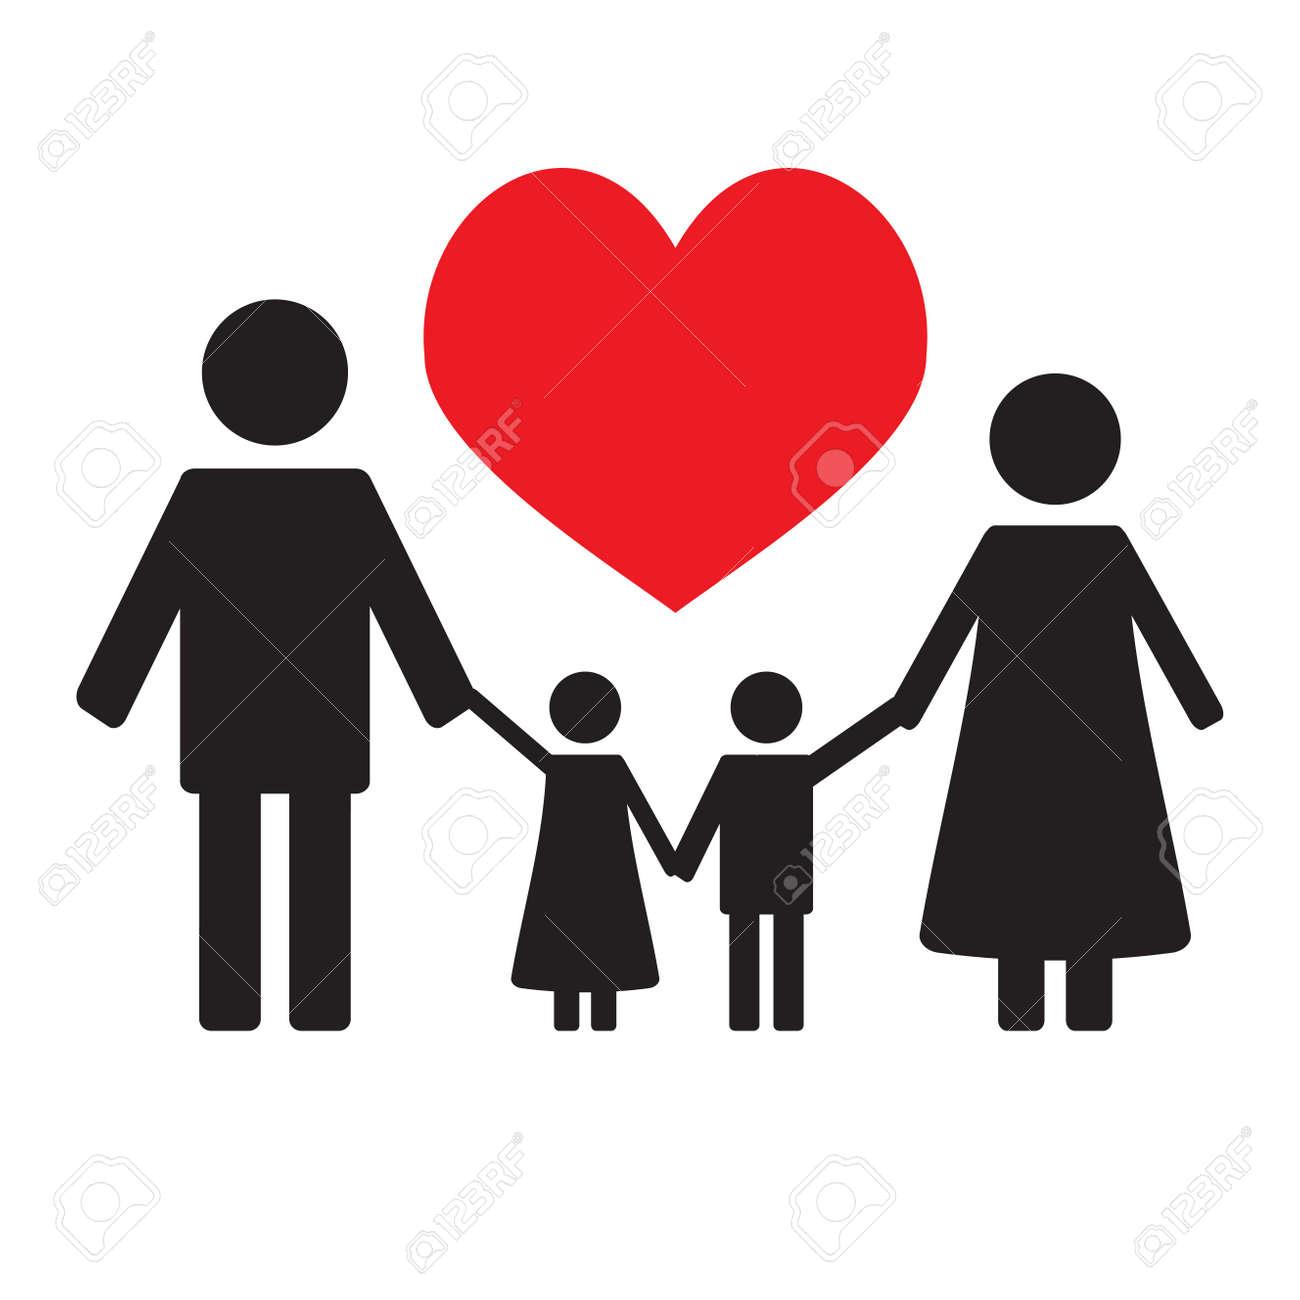 Feliz Amor Familiar La Silueta De La Familia Y Los Niños Aman